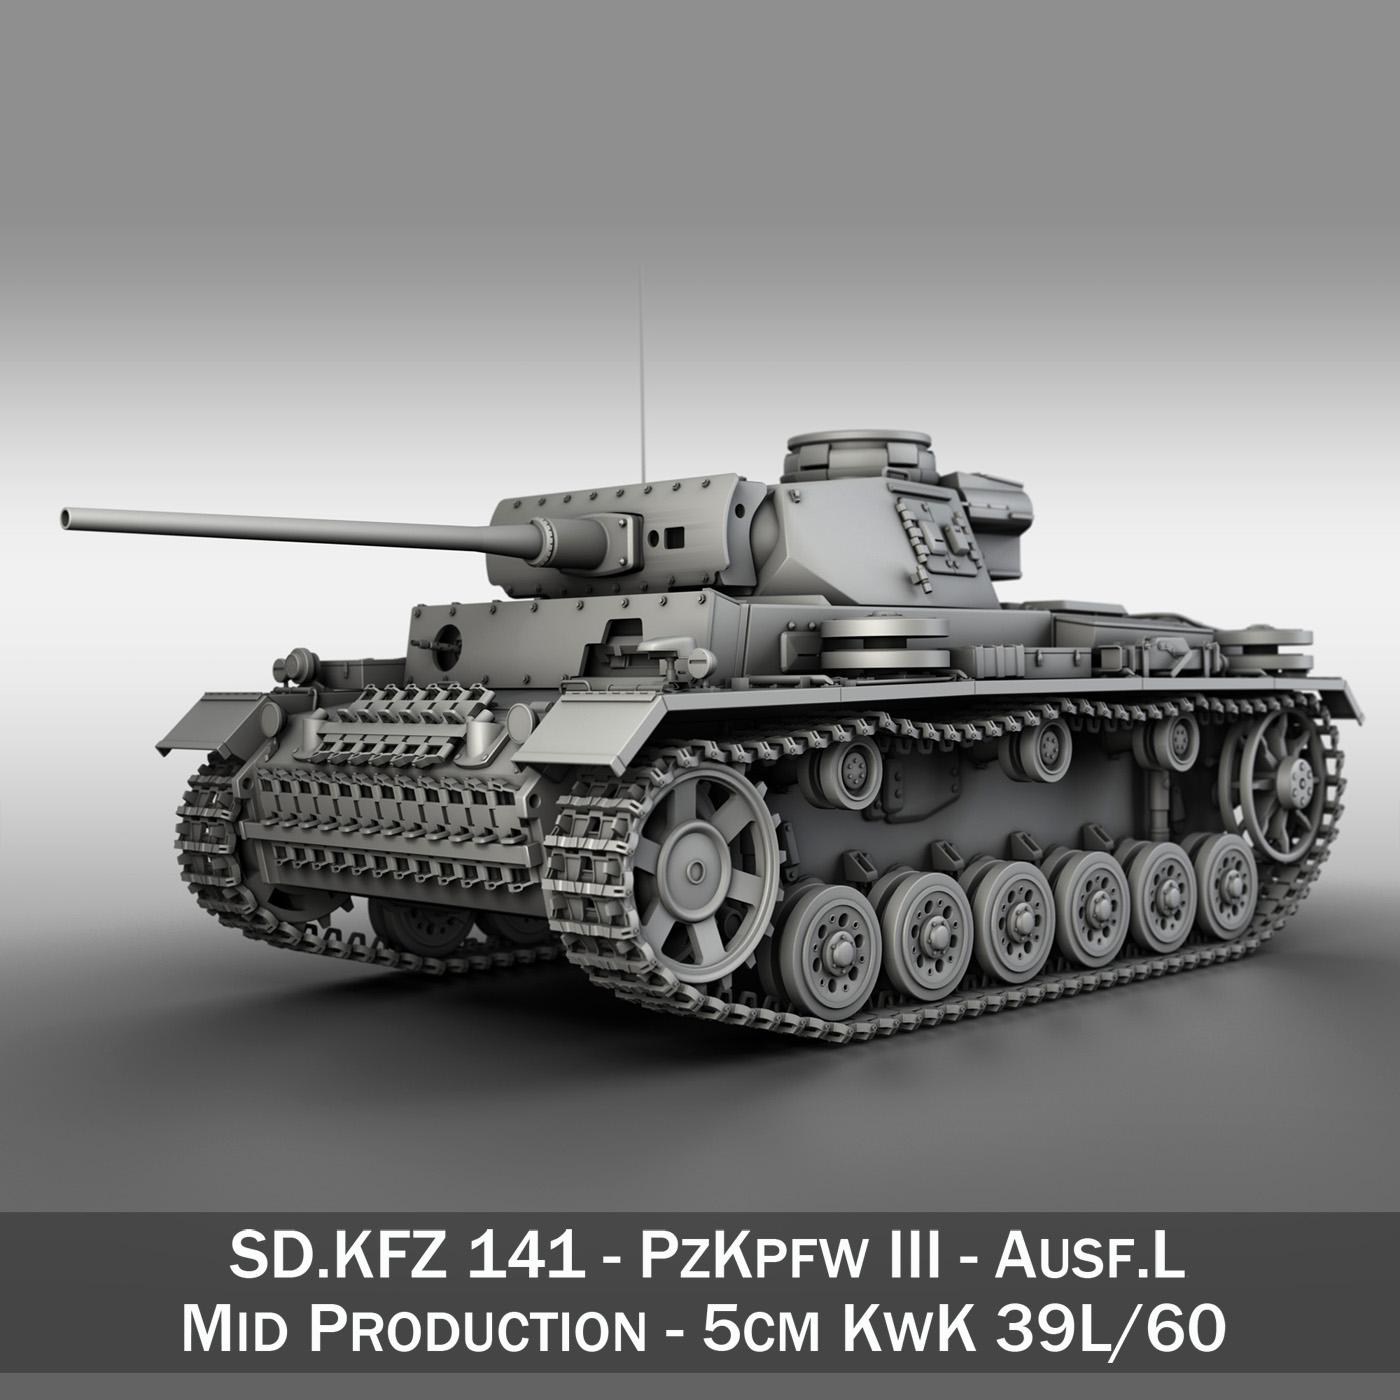 pzkpfw iii - panzerkampfwagen iii - ausf.l model 3d 3ds fbx c4d lwo obj 252154